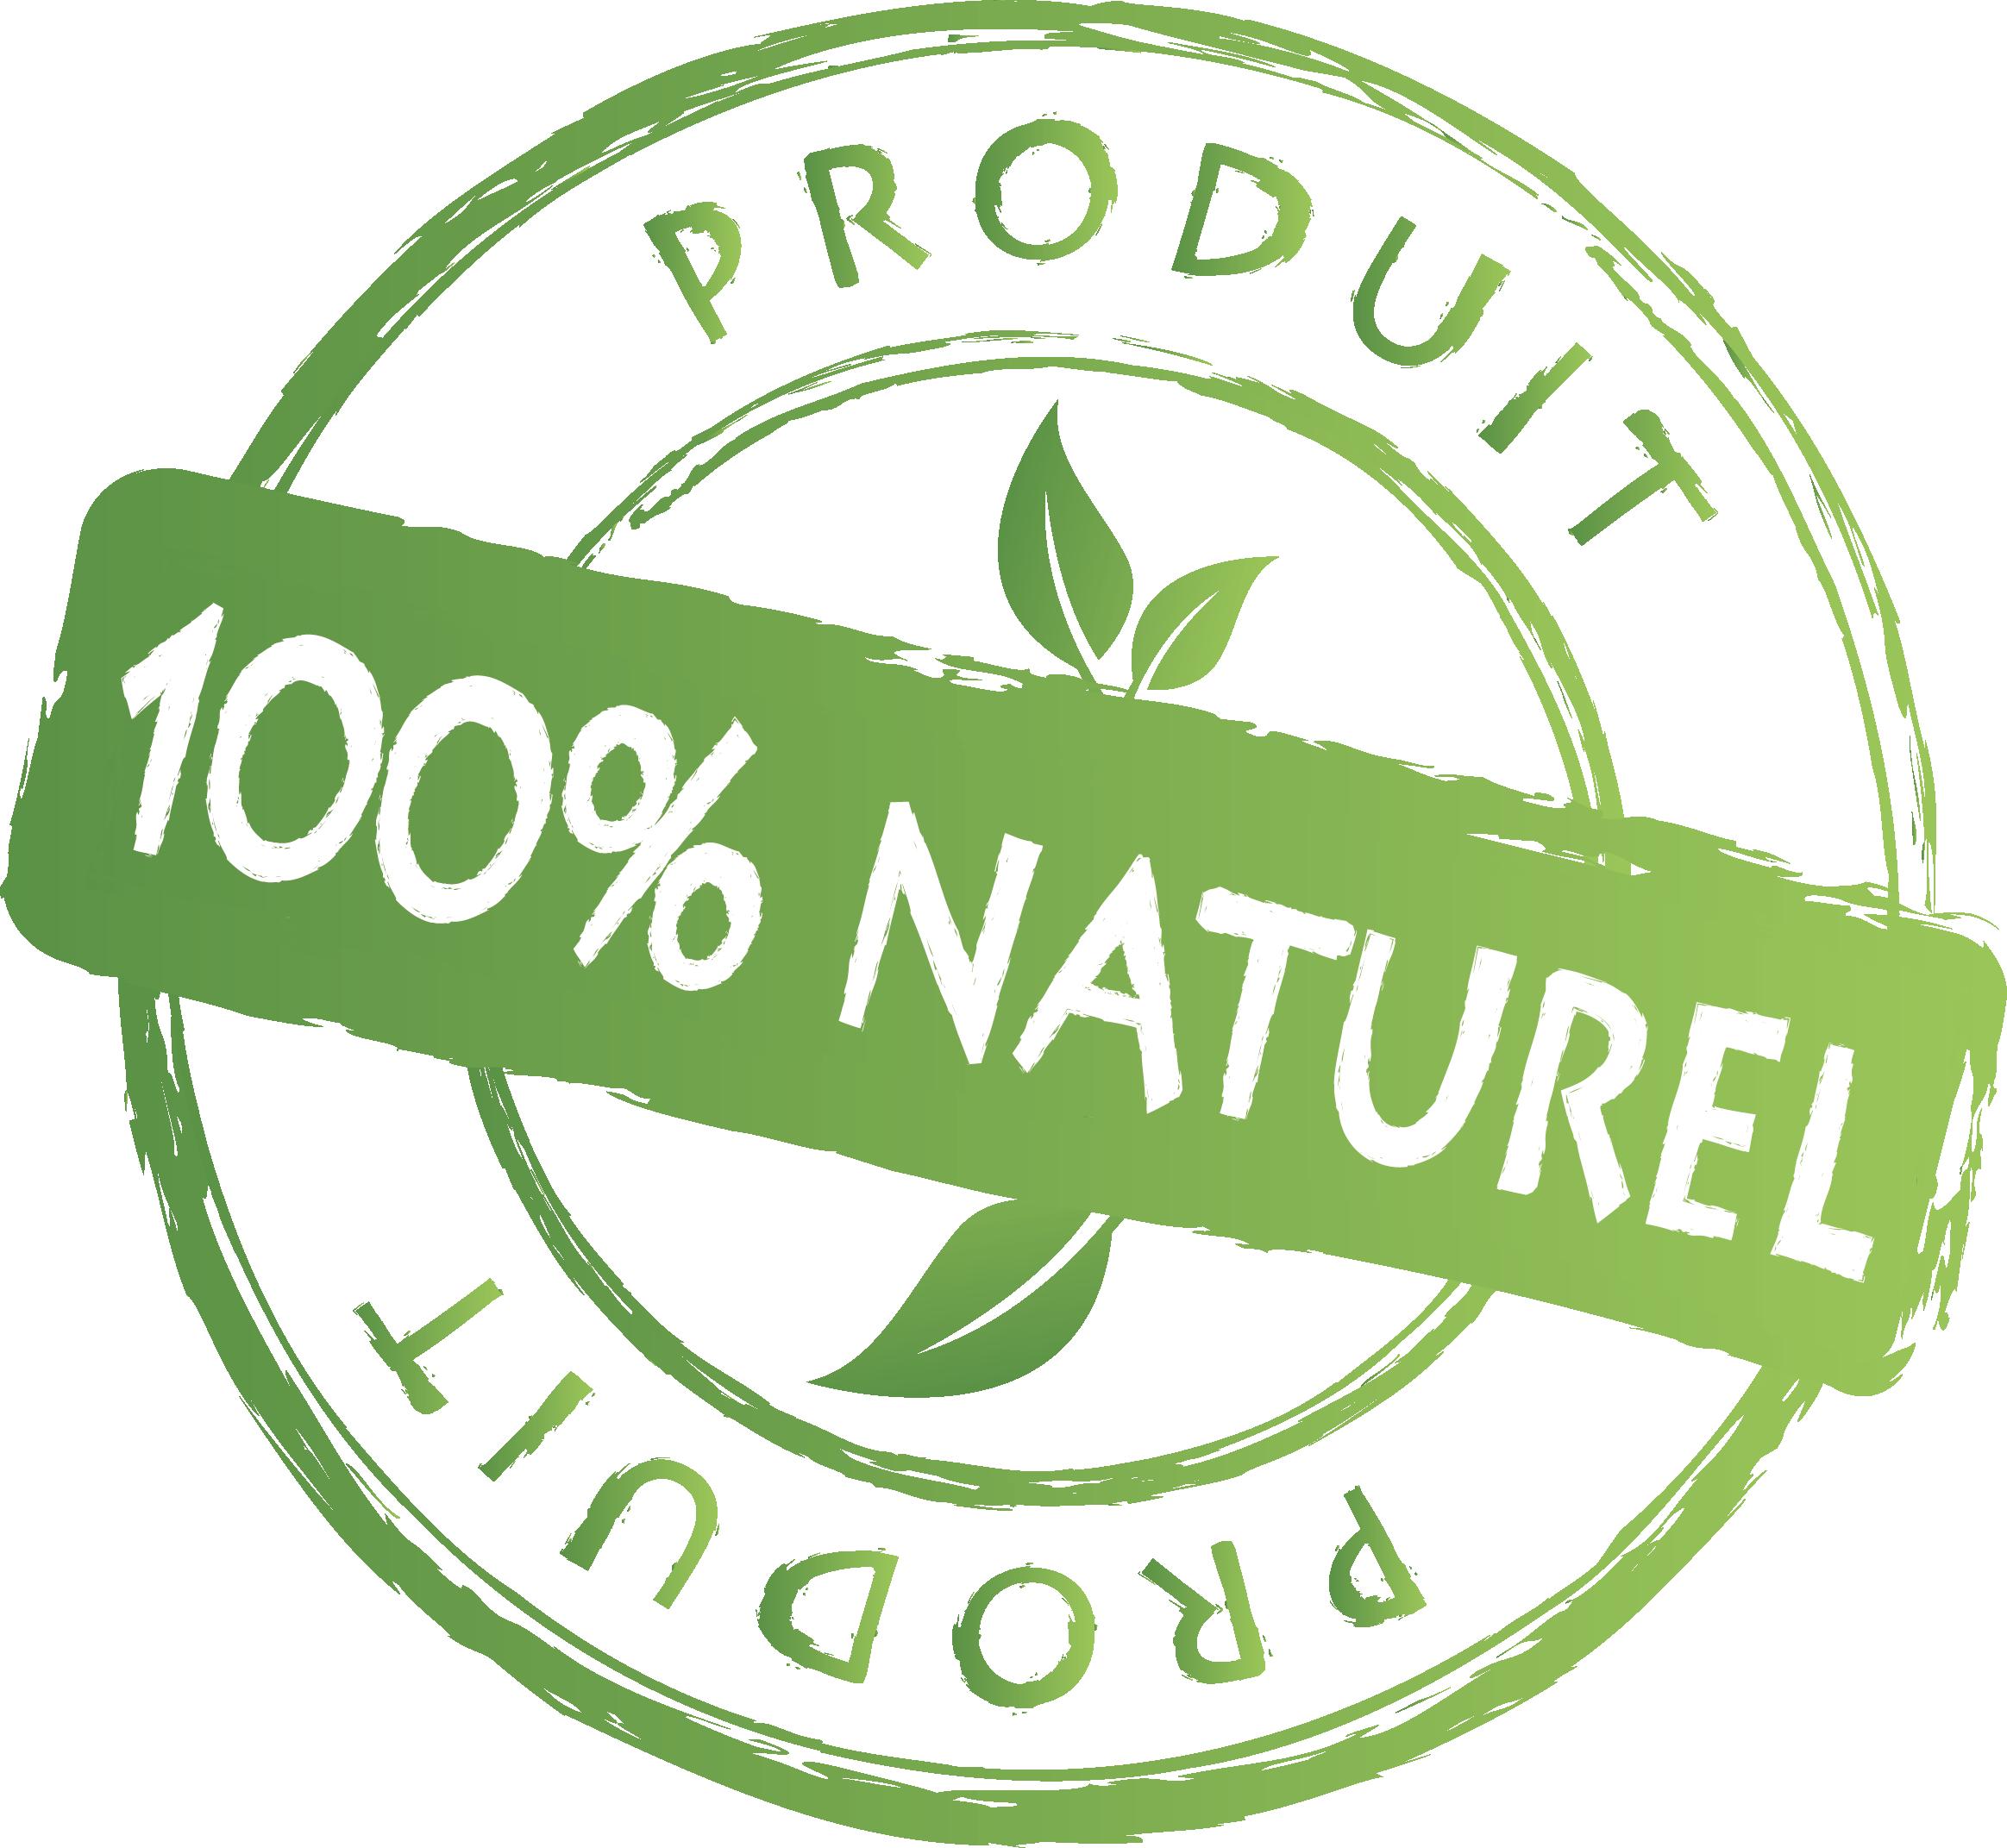 Produit 100% naturel